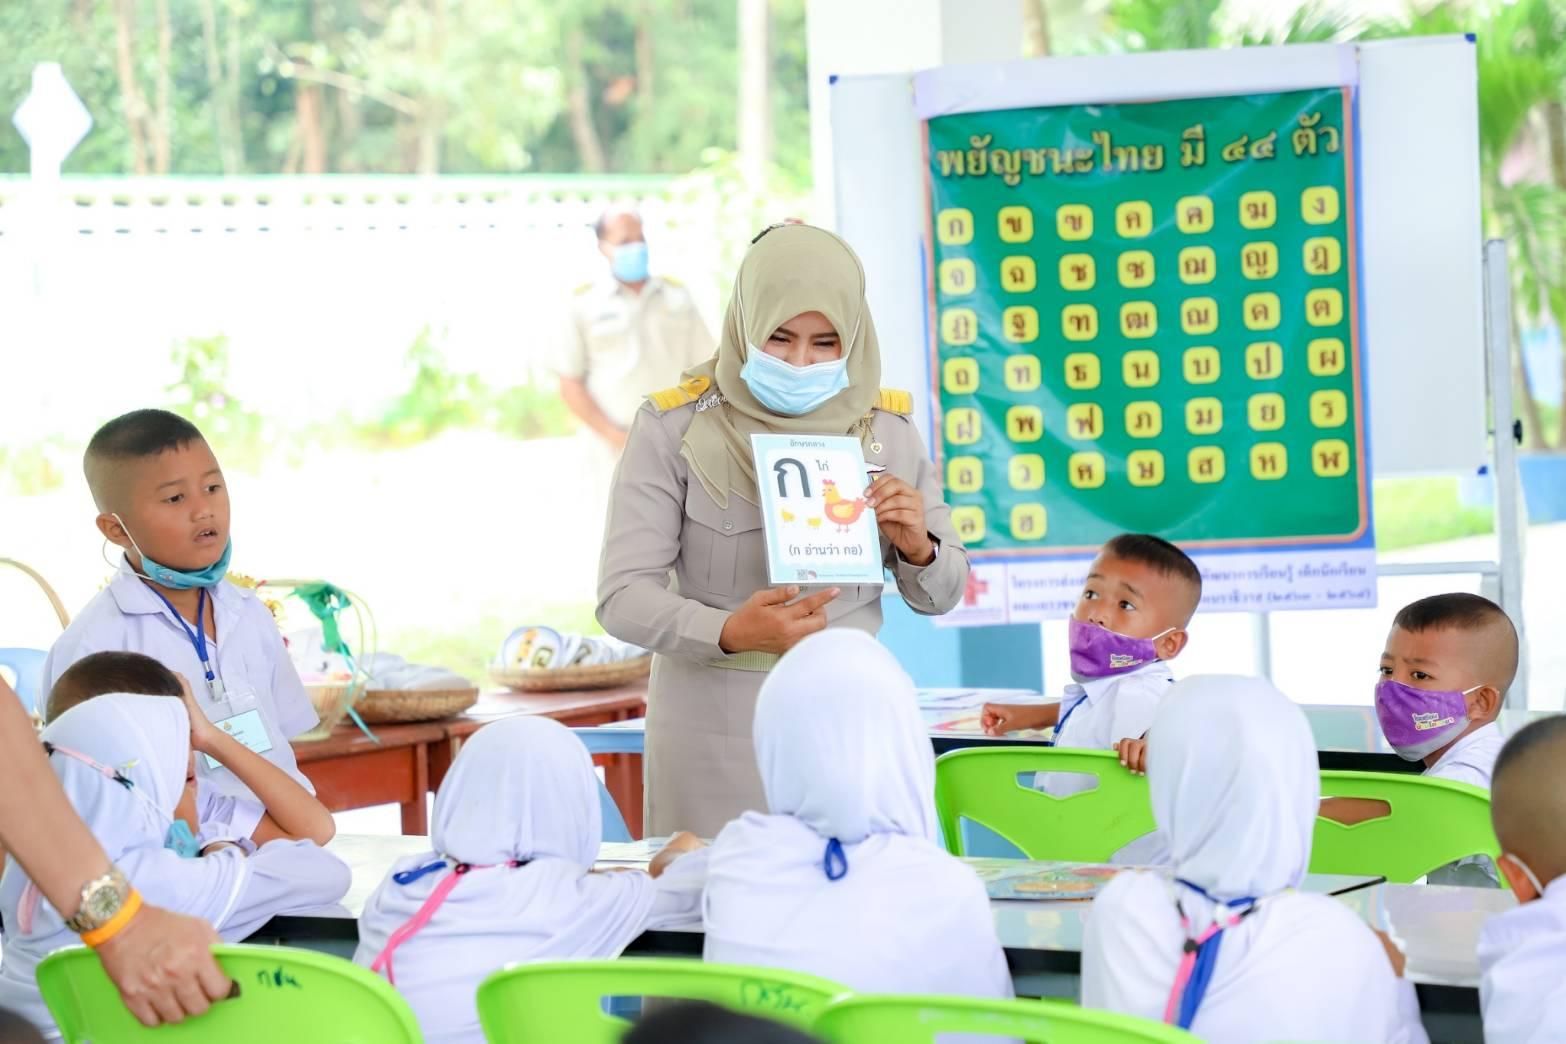 community-based learning programs